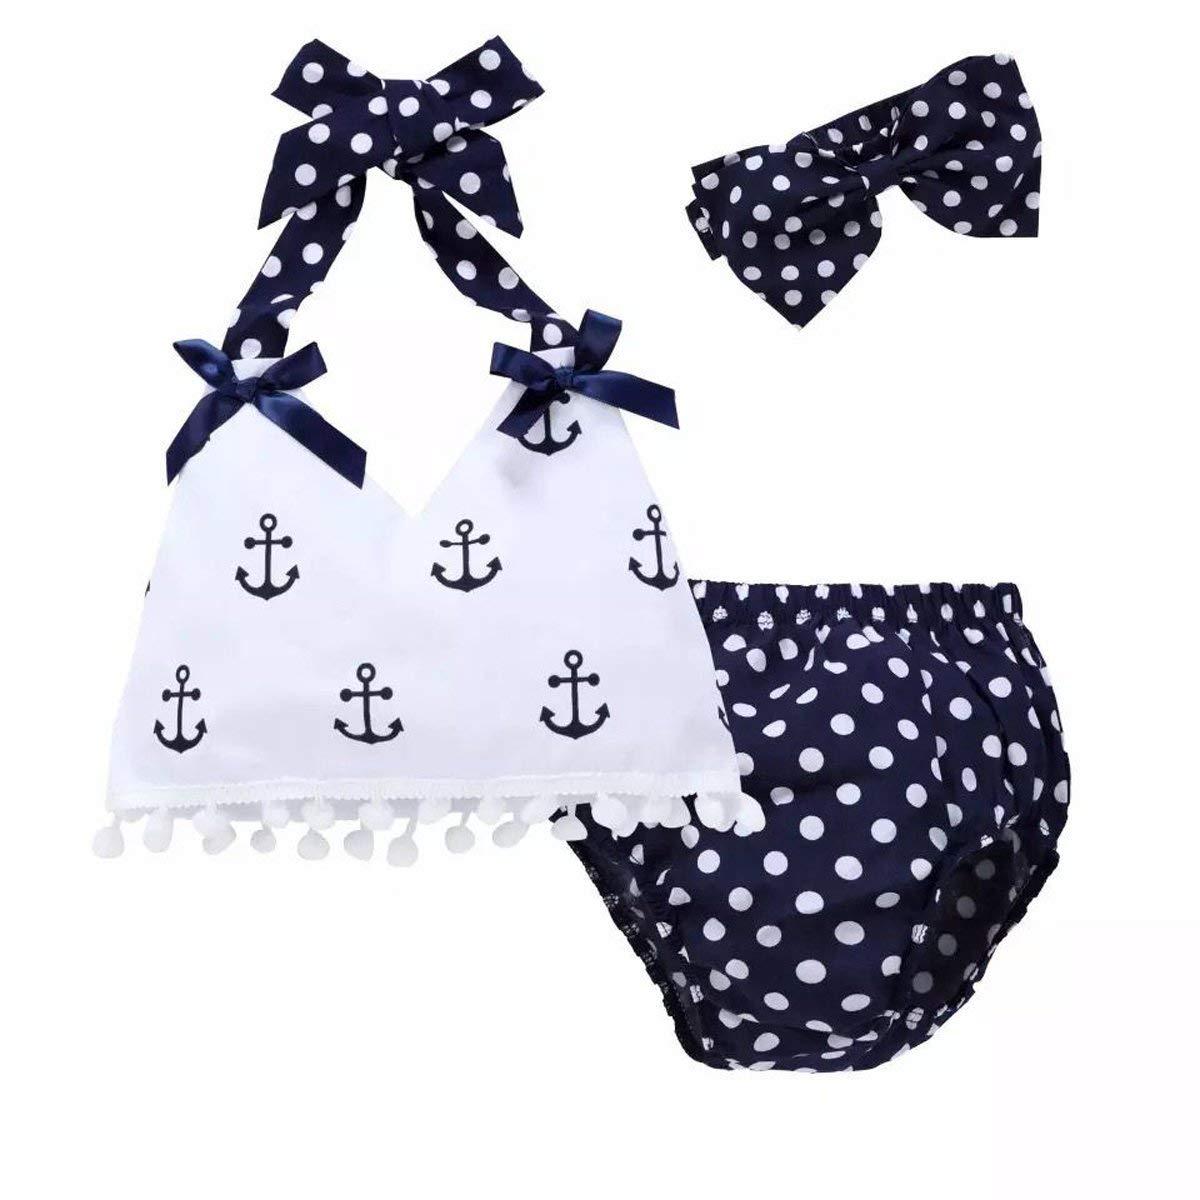 JOYEBUY 3PC Baby Girls Clothing Set Anchor Tops+Polka Dot Briefs+Headband Outfits Set Sunsuit